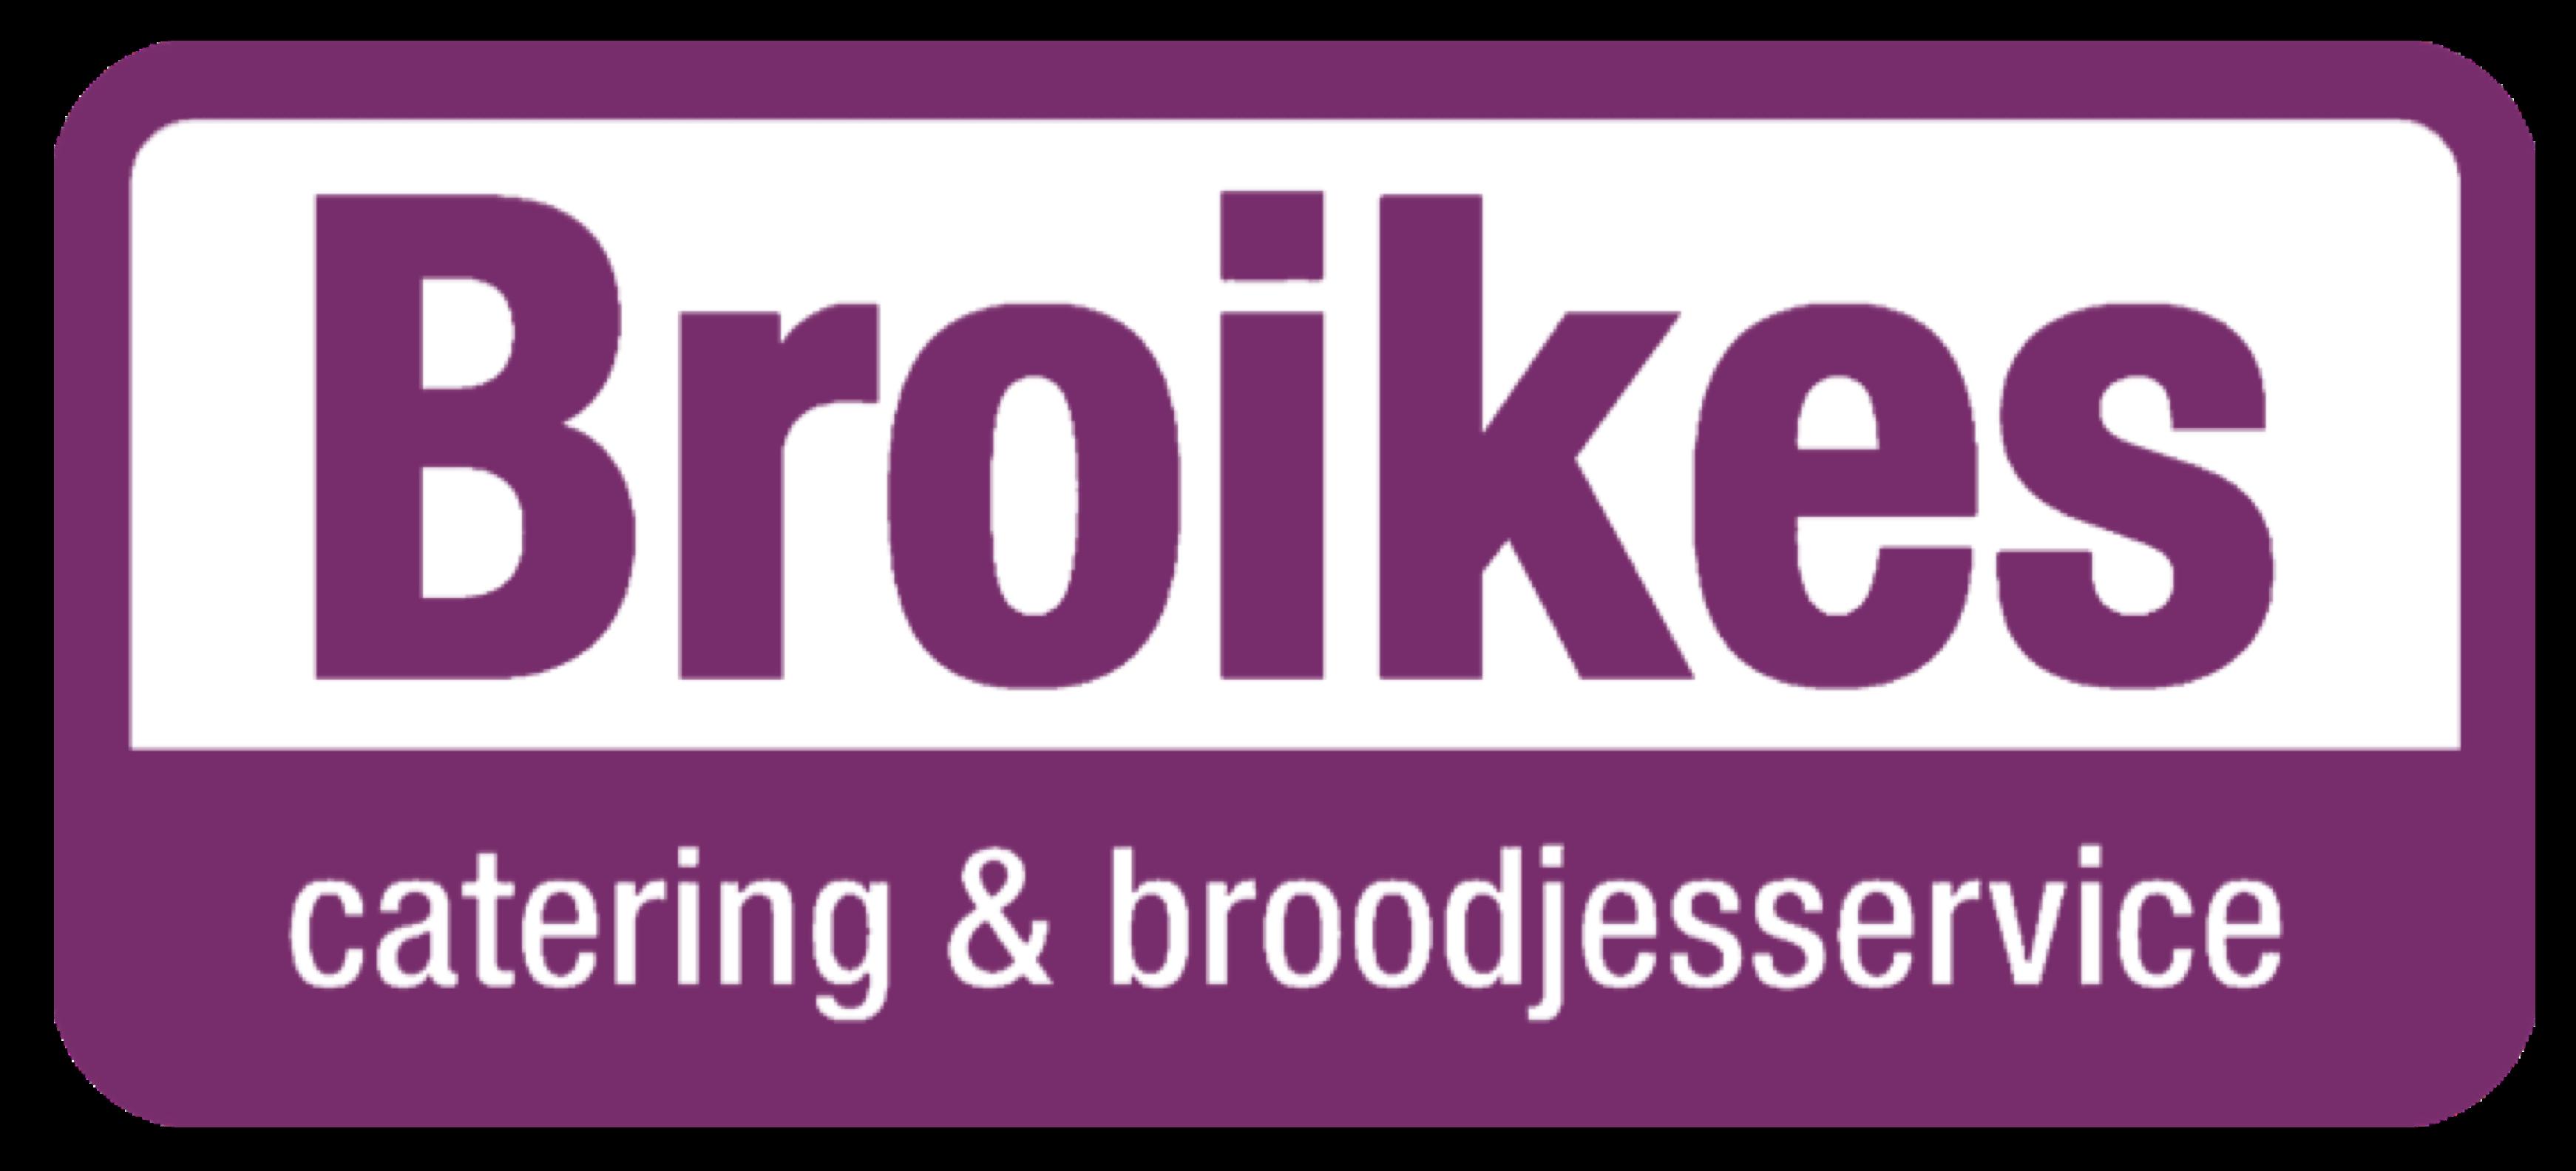 Broikes